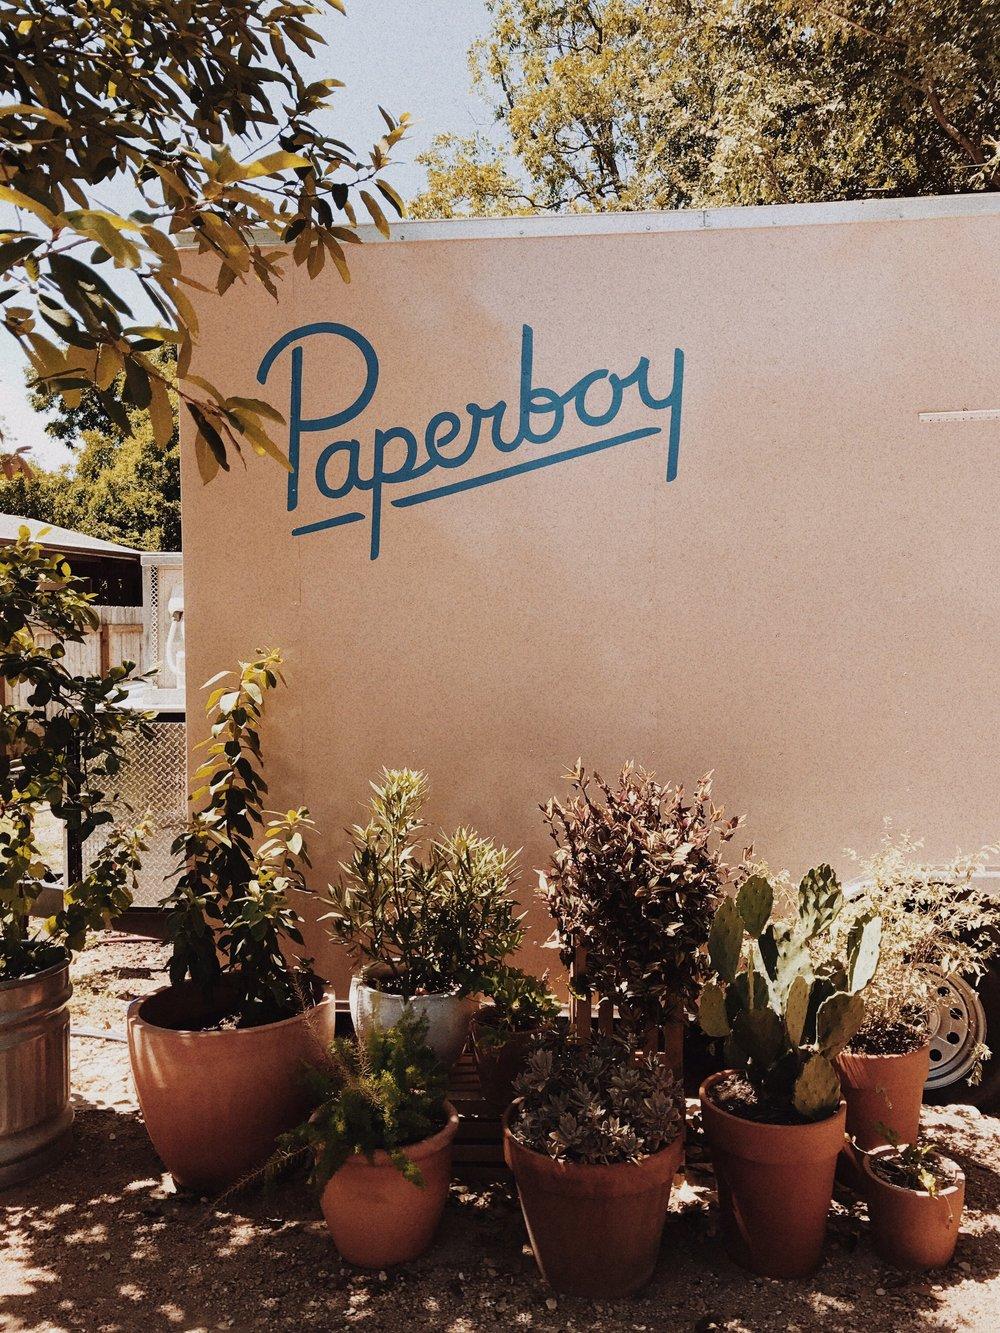 Paperboy Food Truck